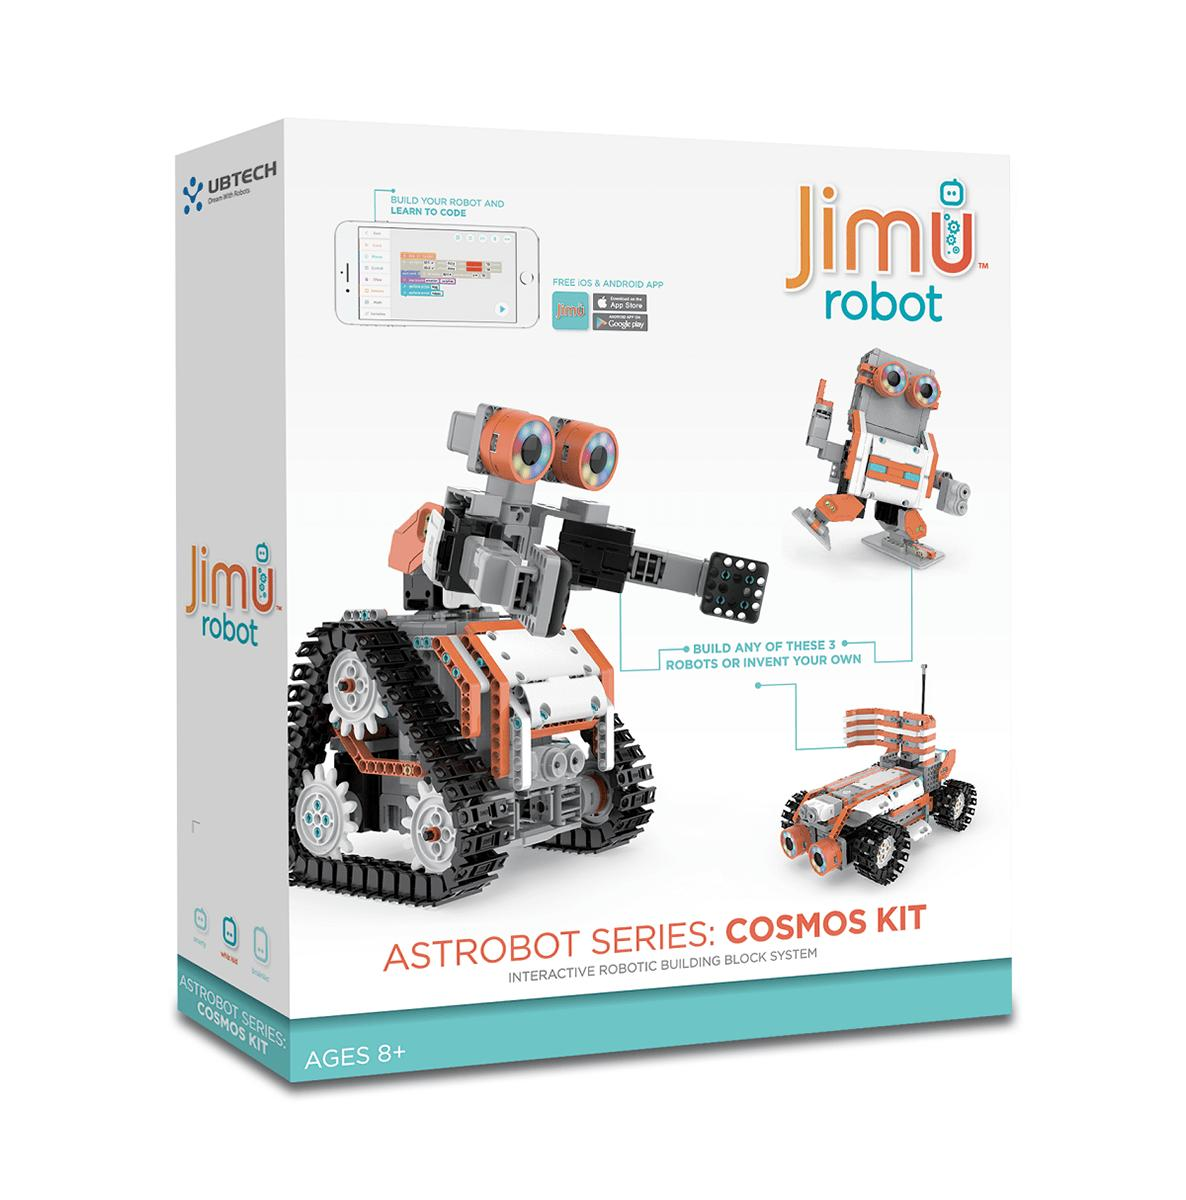 Robot Giáo dục UBTECH JIMU Astro Bot (Astrobot)